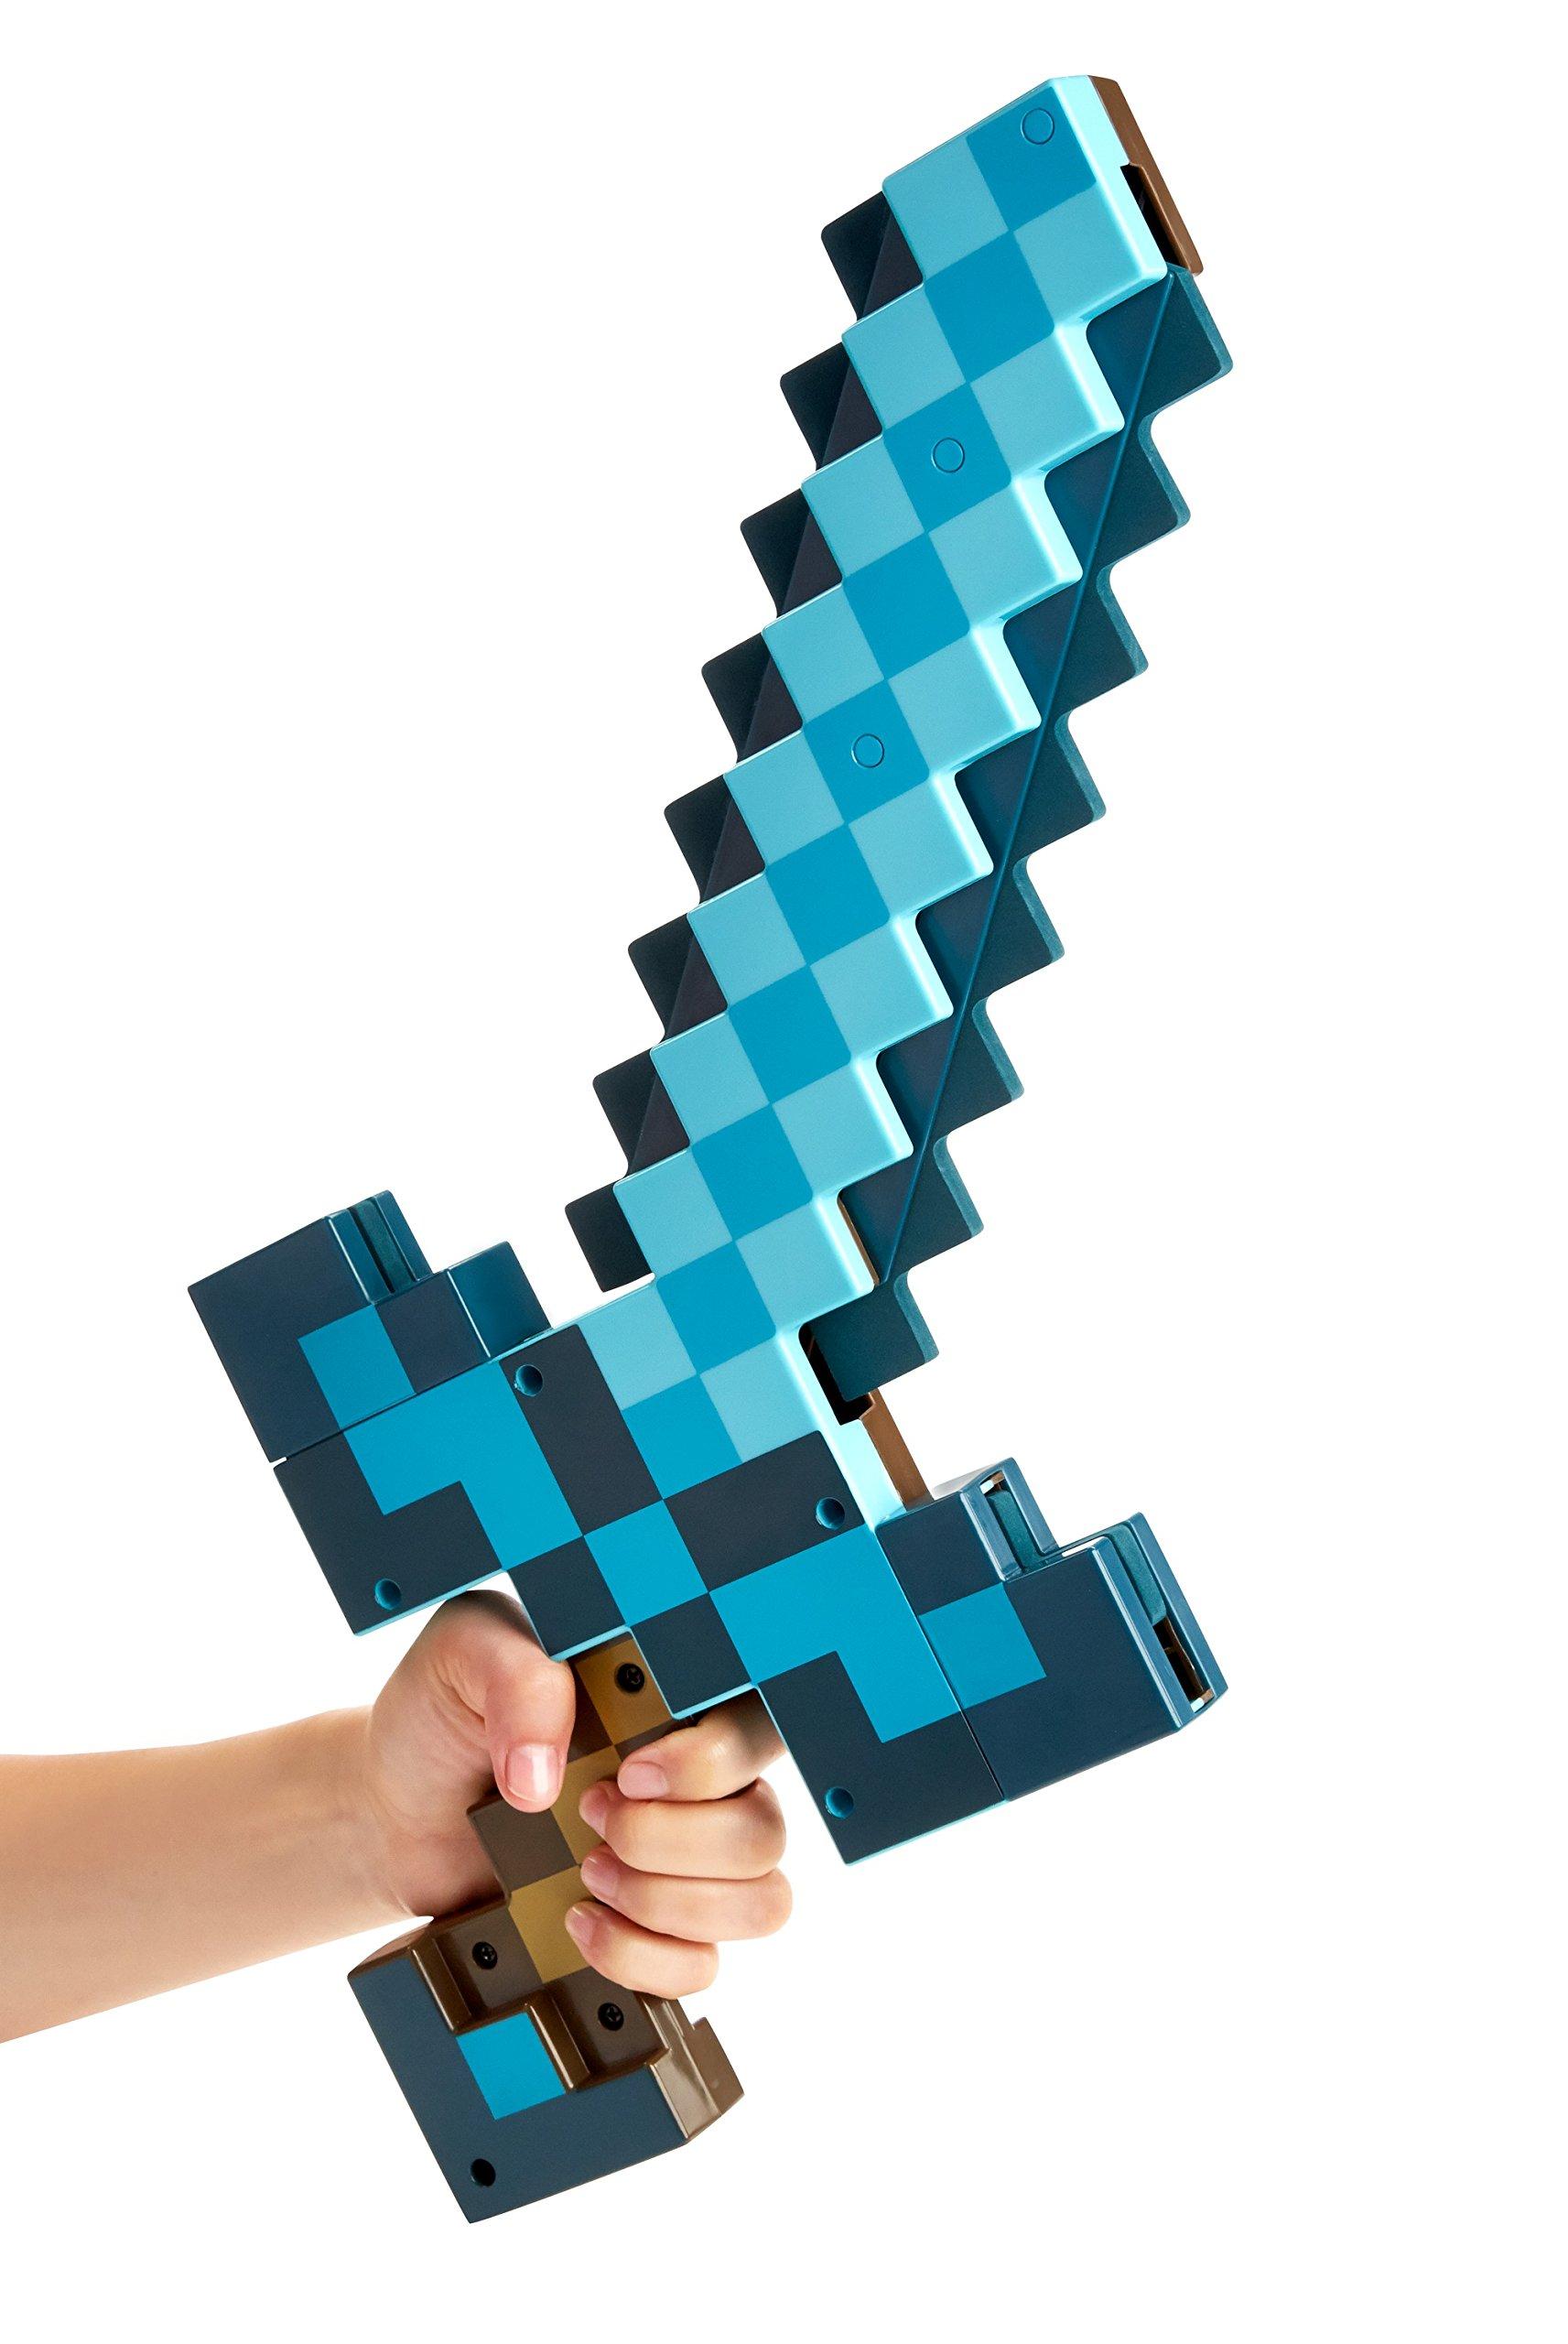 Mattel Minecraft Transforming Sword & Pickaxe Action Figure